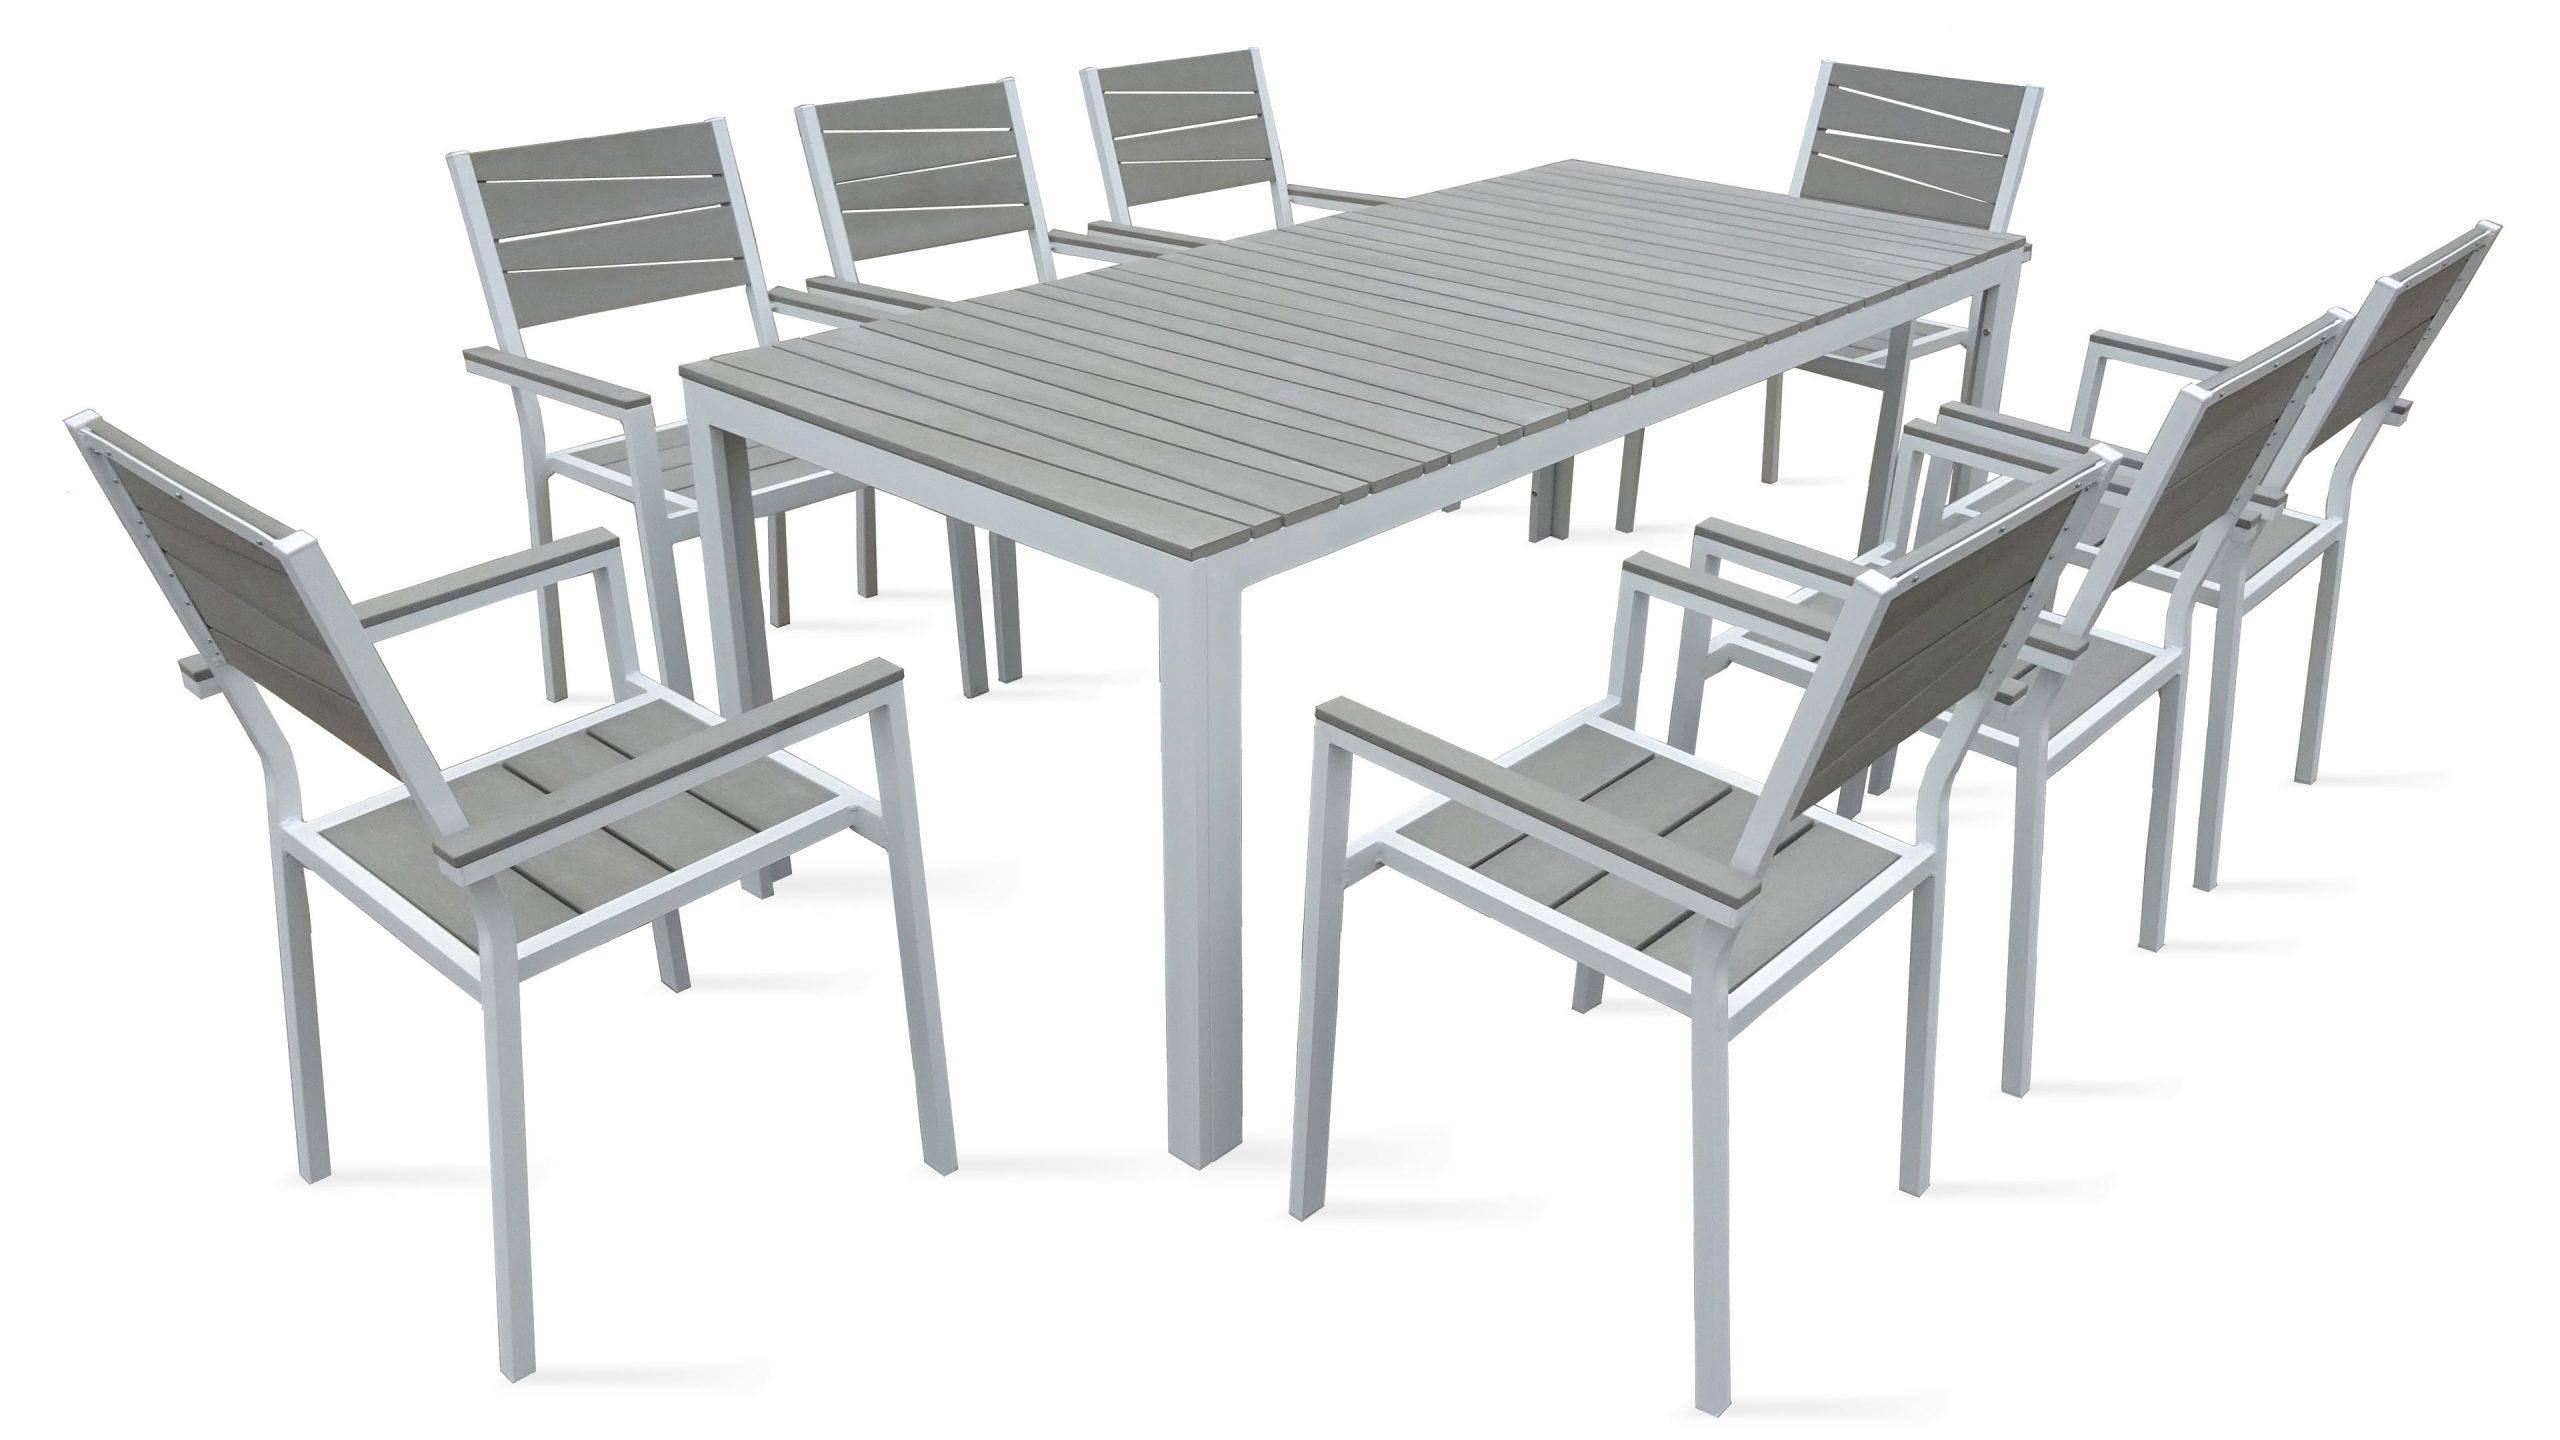 Table De Jardin 8 Places Aluminium Polywood encequiconcerne Table De Jardin En Alu